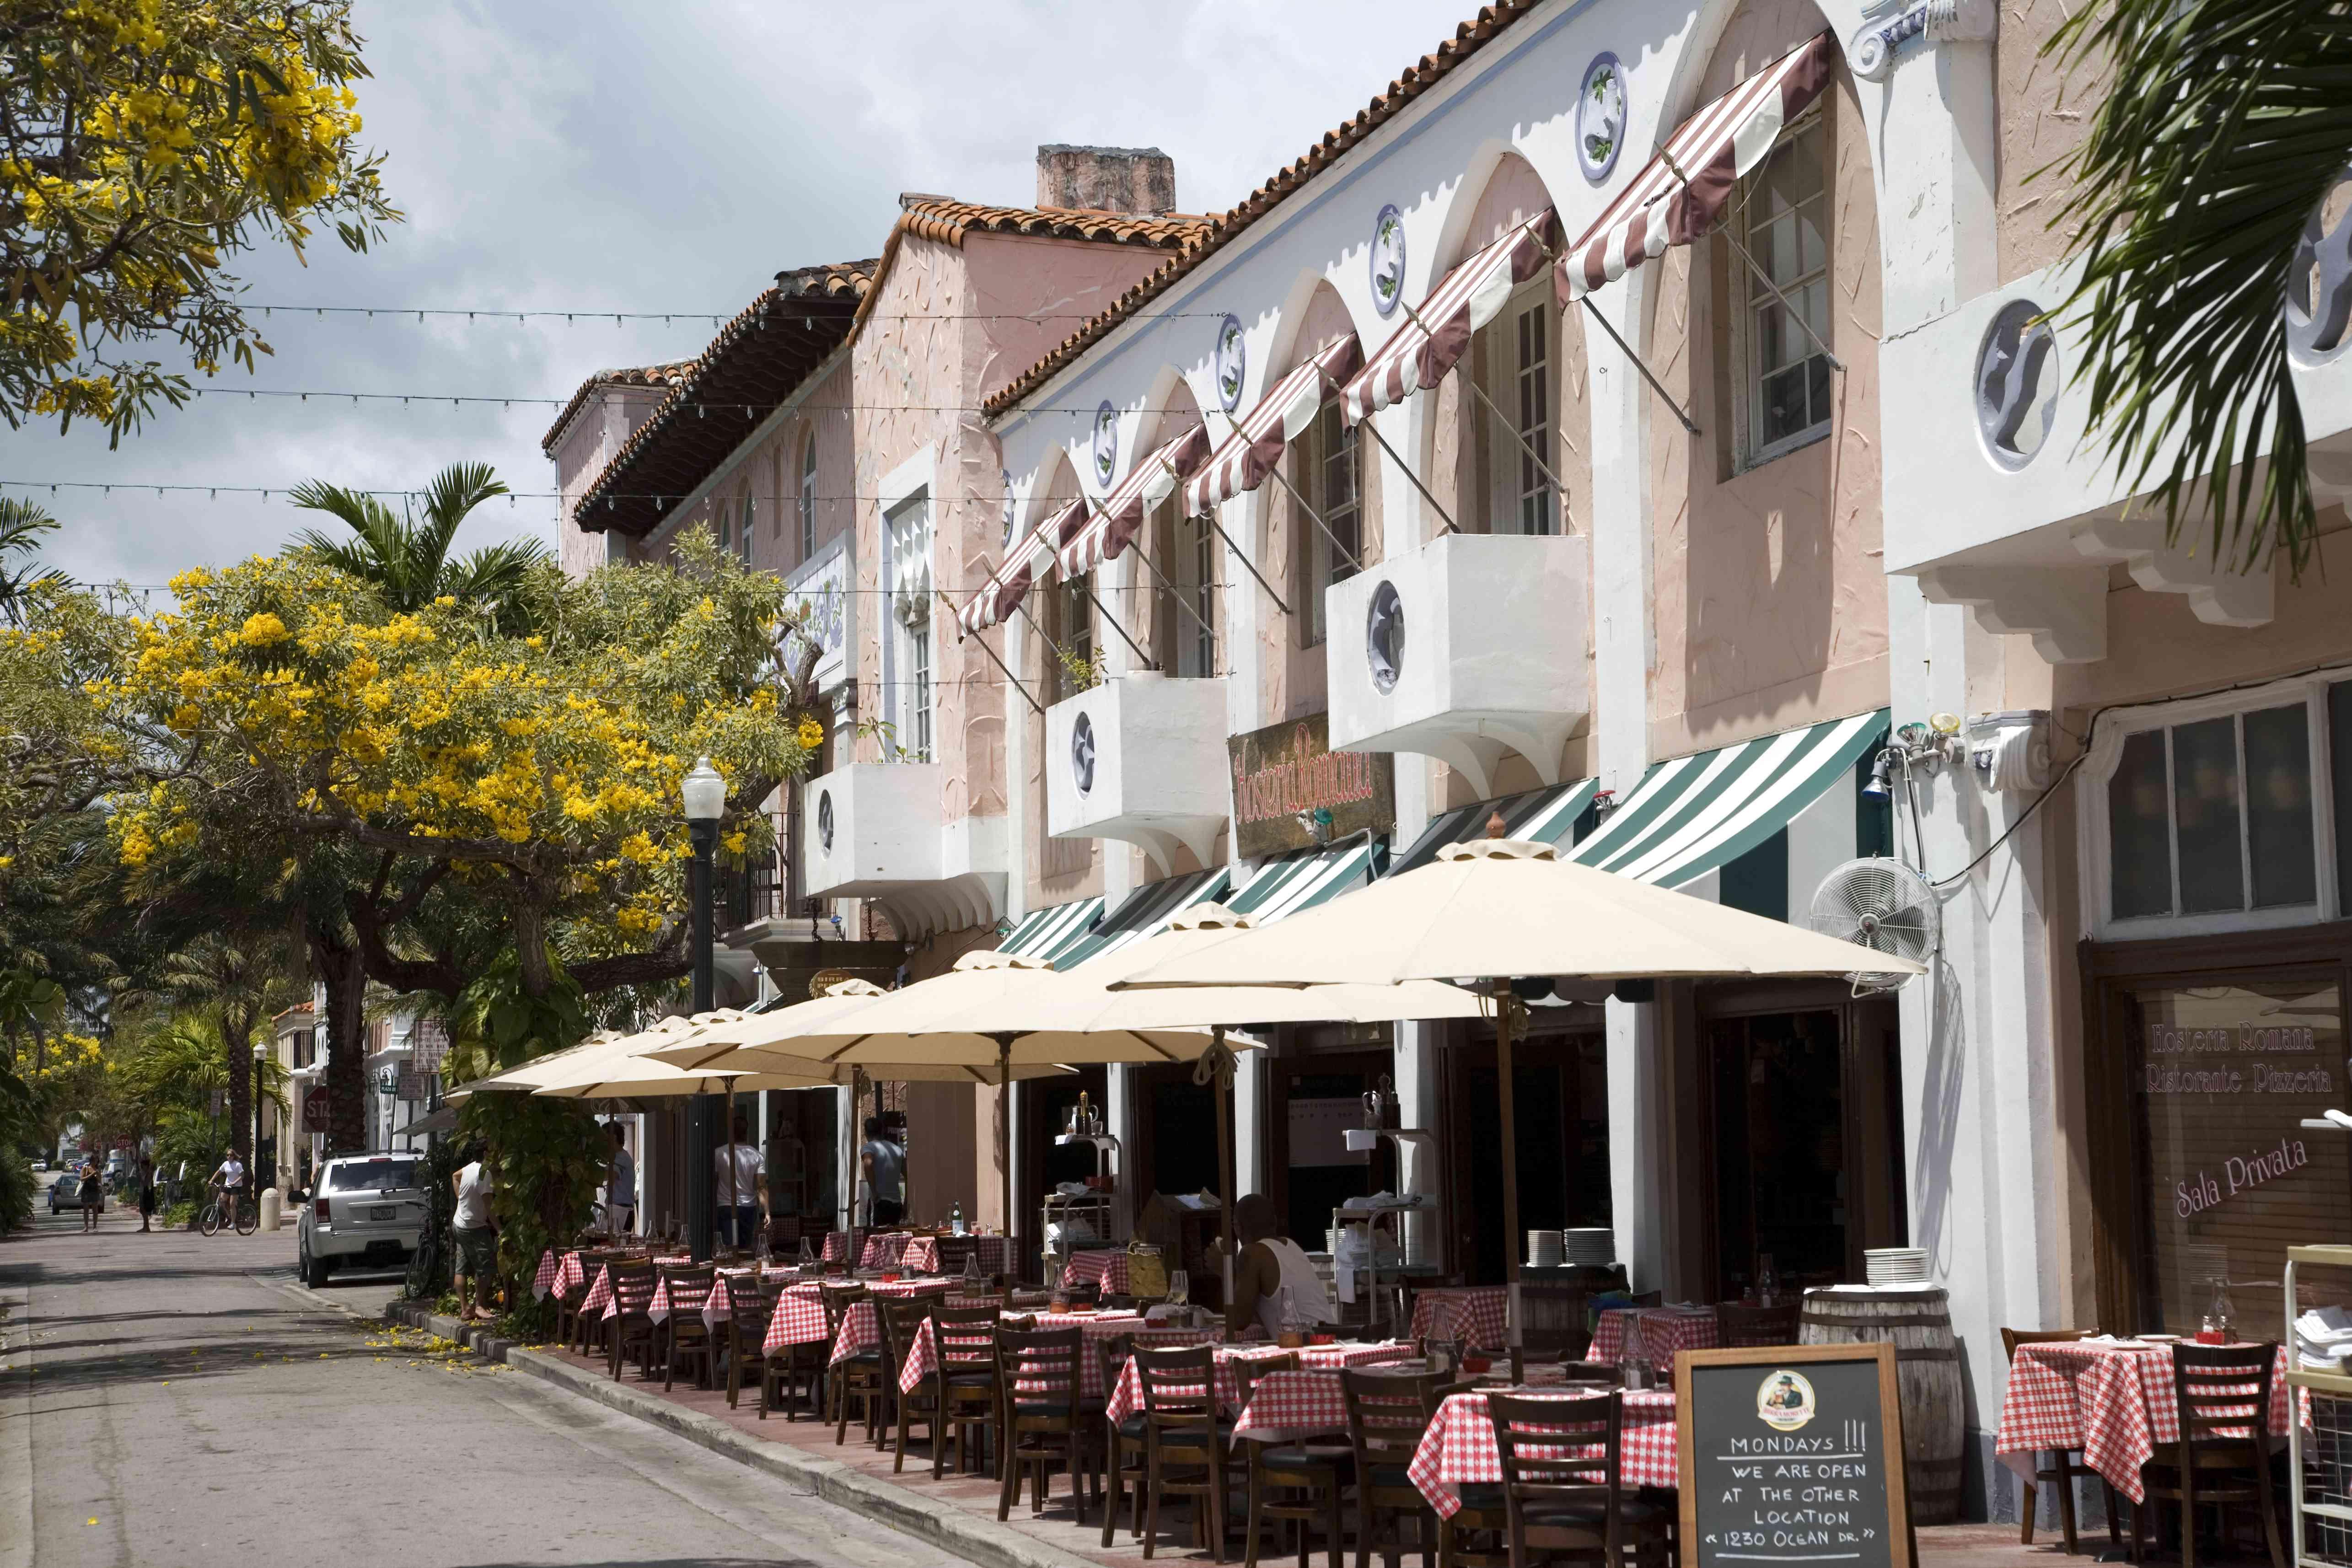 USA, Florida, Miami Beach. Restaurant in Espanola way.